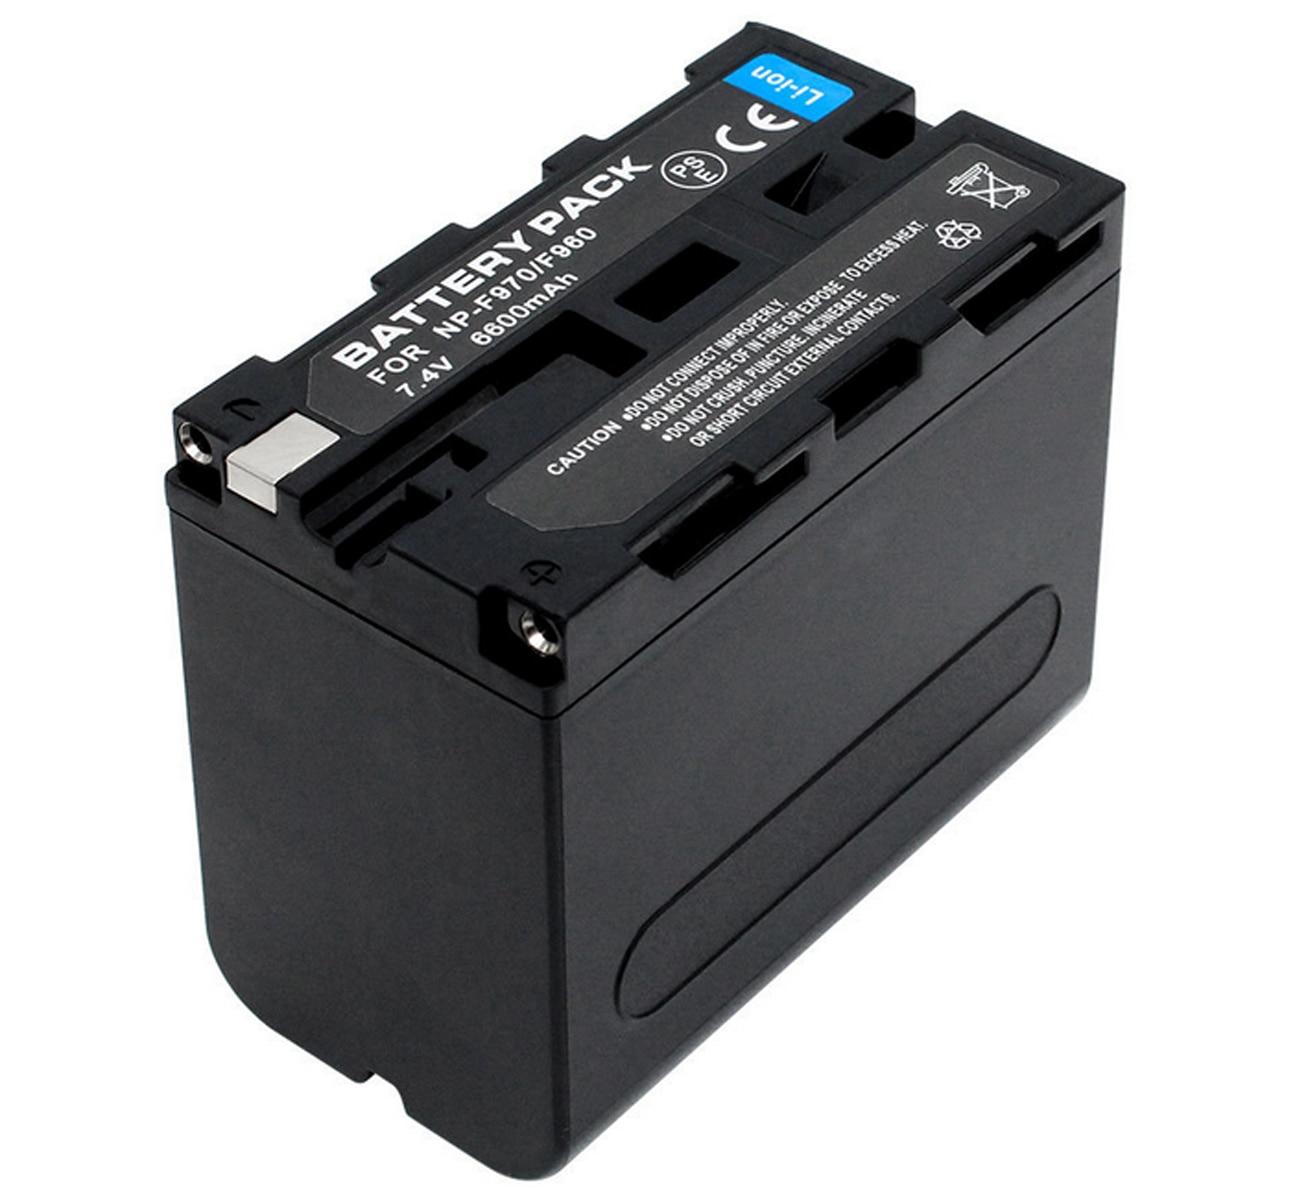 Battery Pack For Sony NP-F930, NP-F950, NP-F950/B, NP-F960, NP-F970, NP-F 970, NPF970, 2NP-F970/B InfoLITHIUM L Series